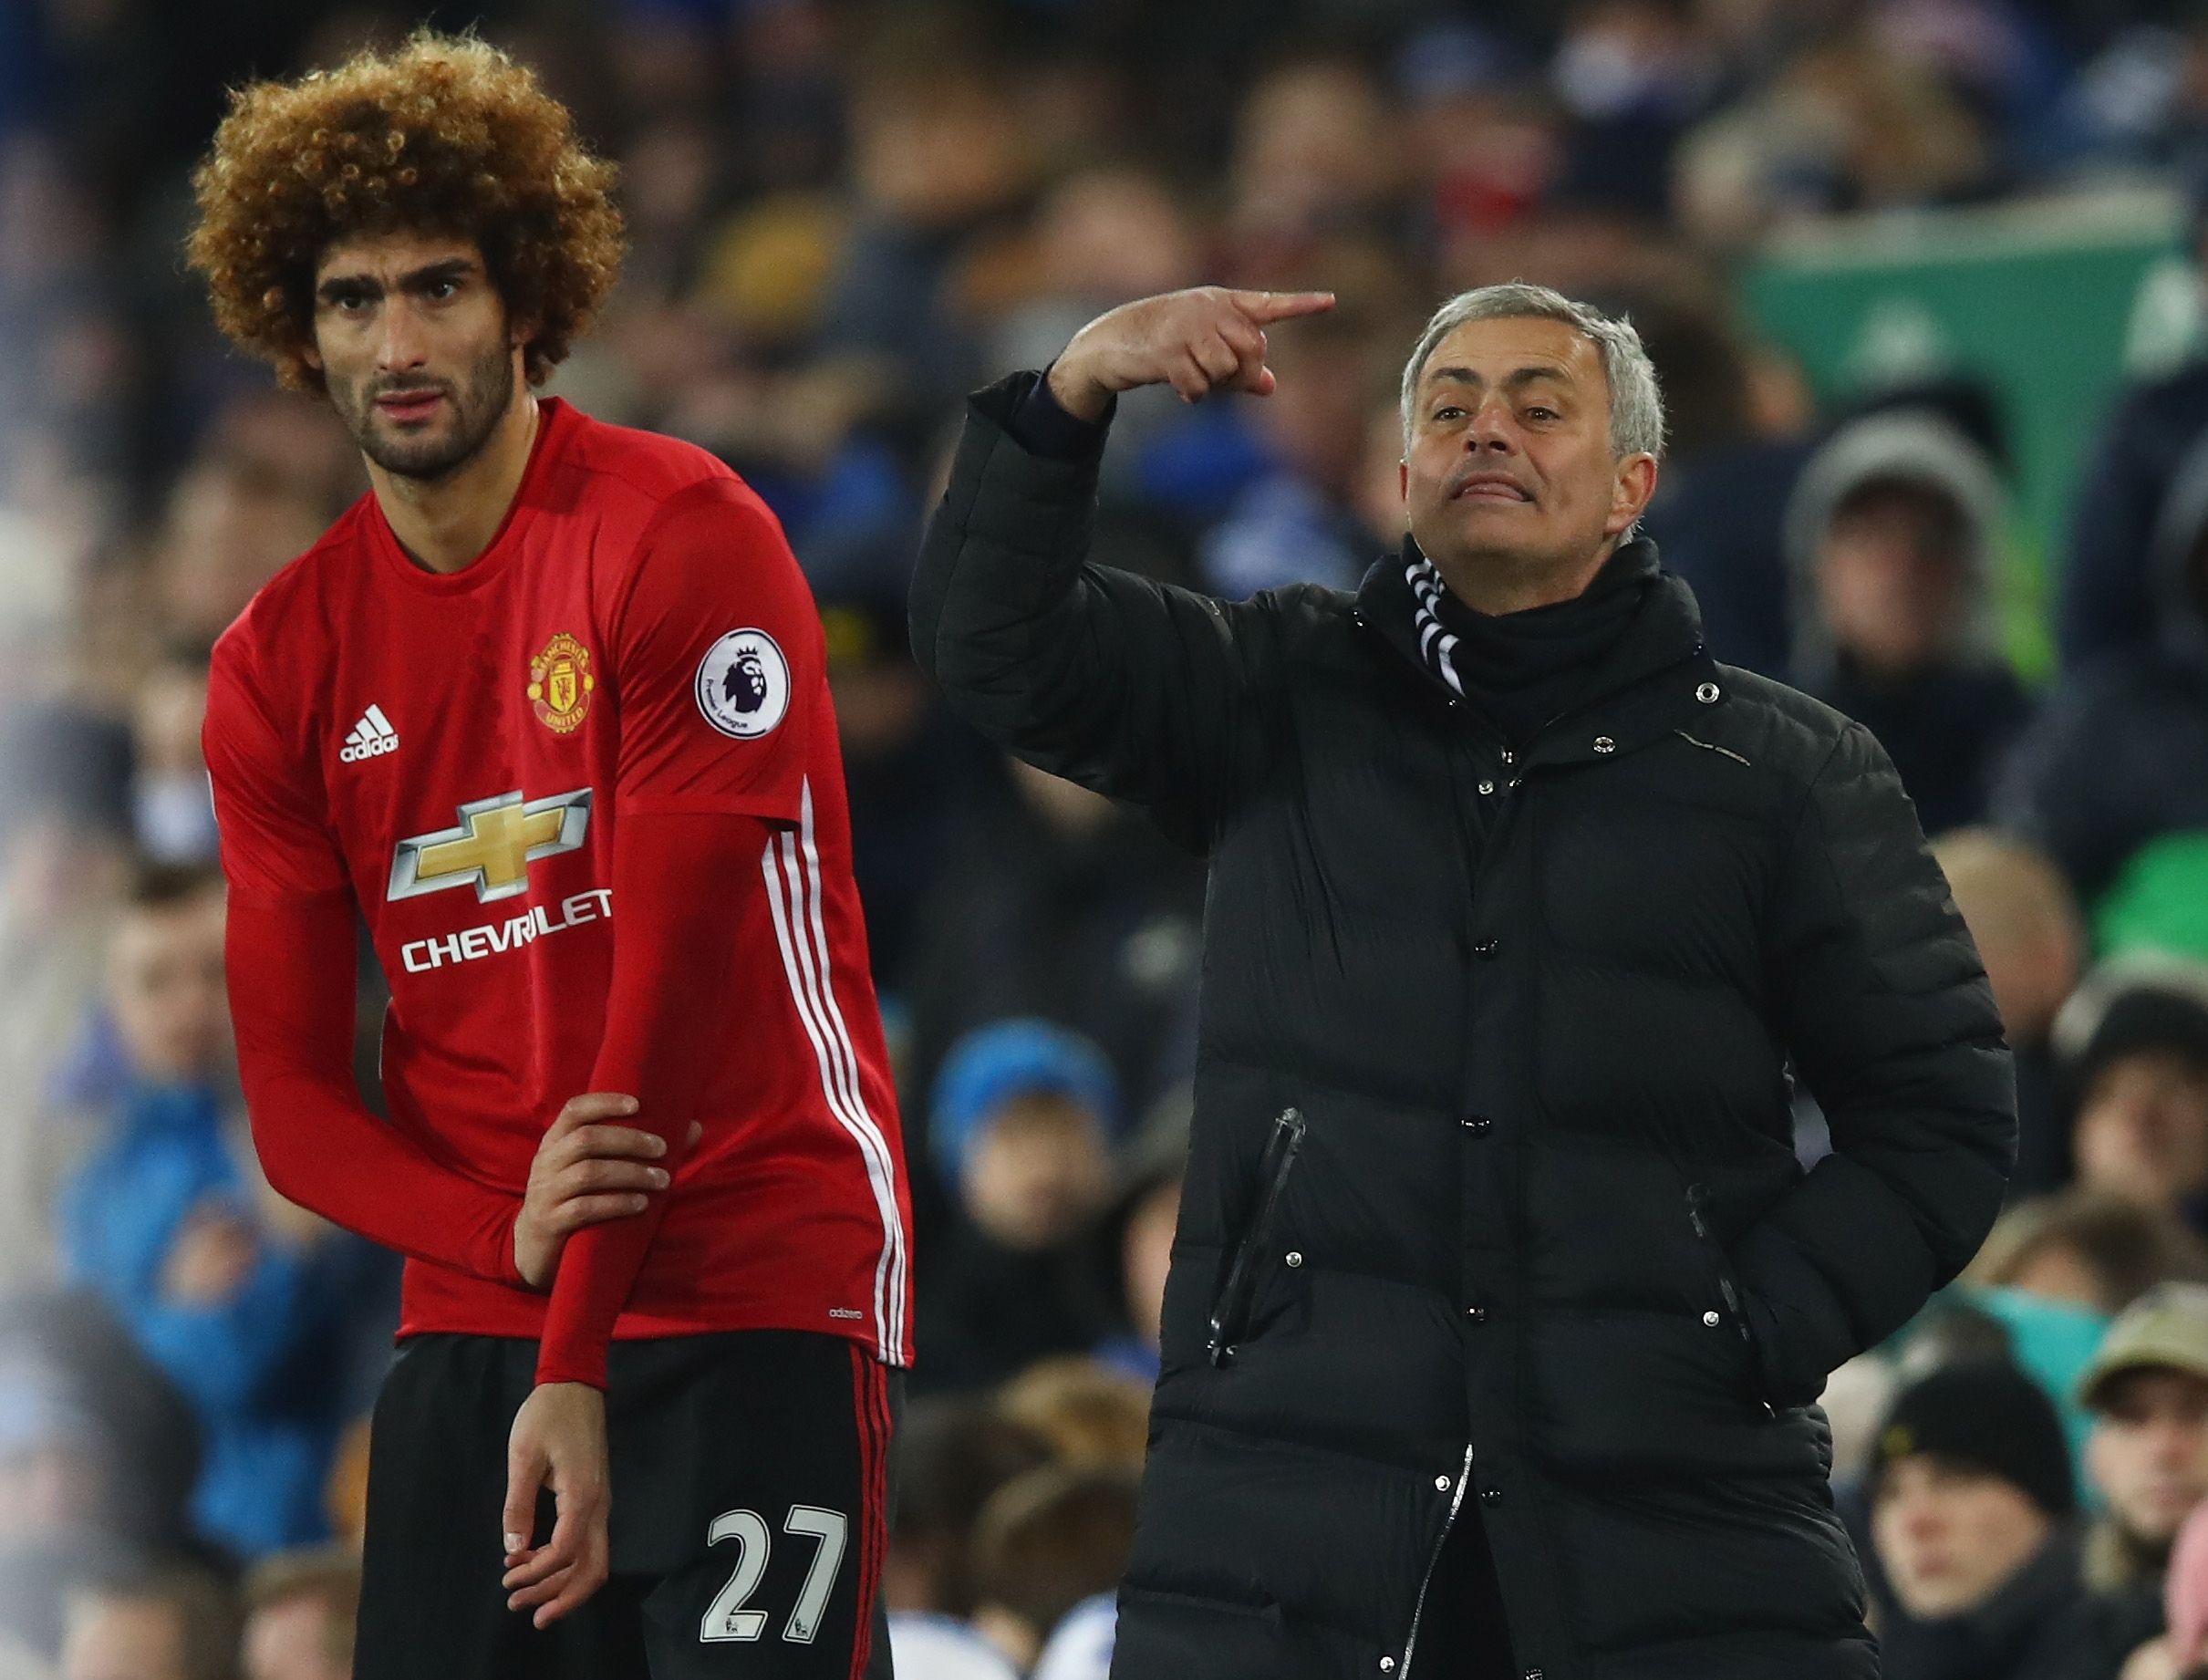 Manchester United's Marouane Fellaini, left, with Jose Mourinho.